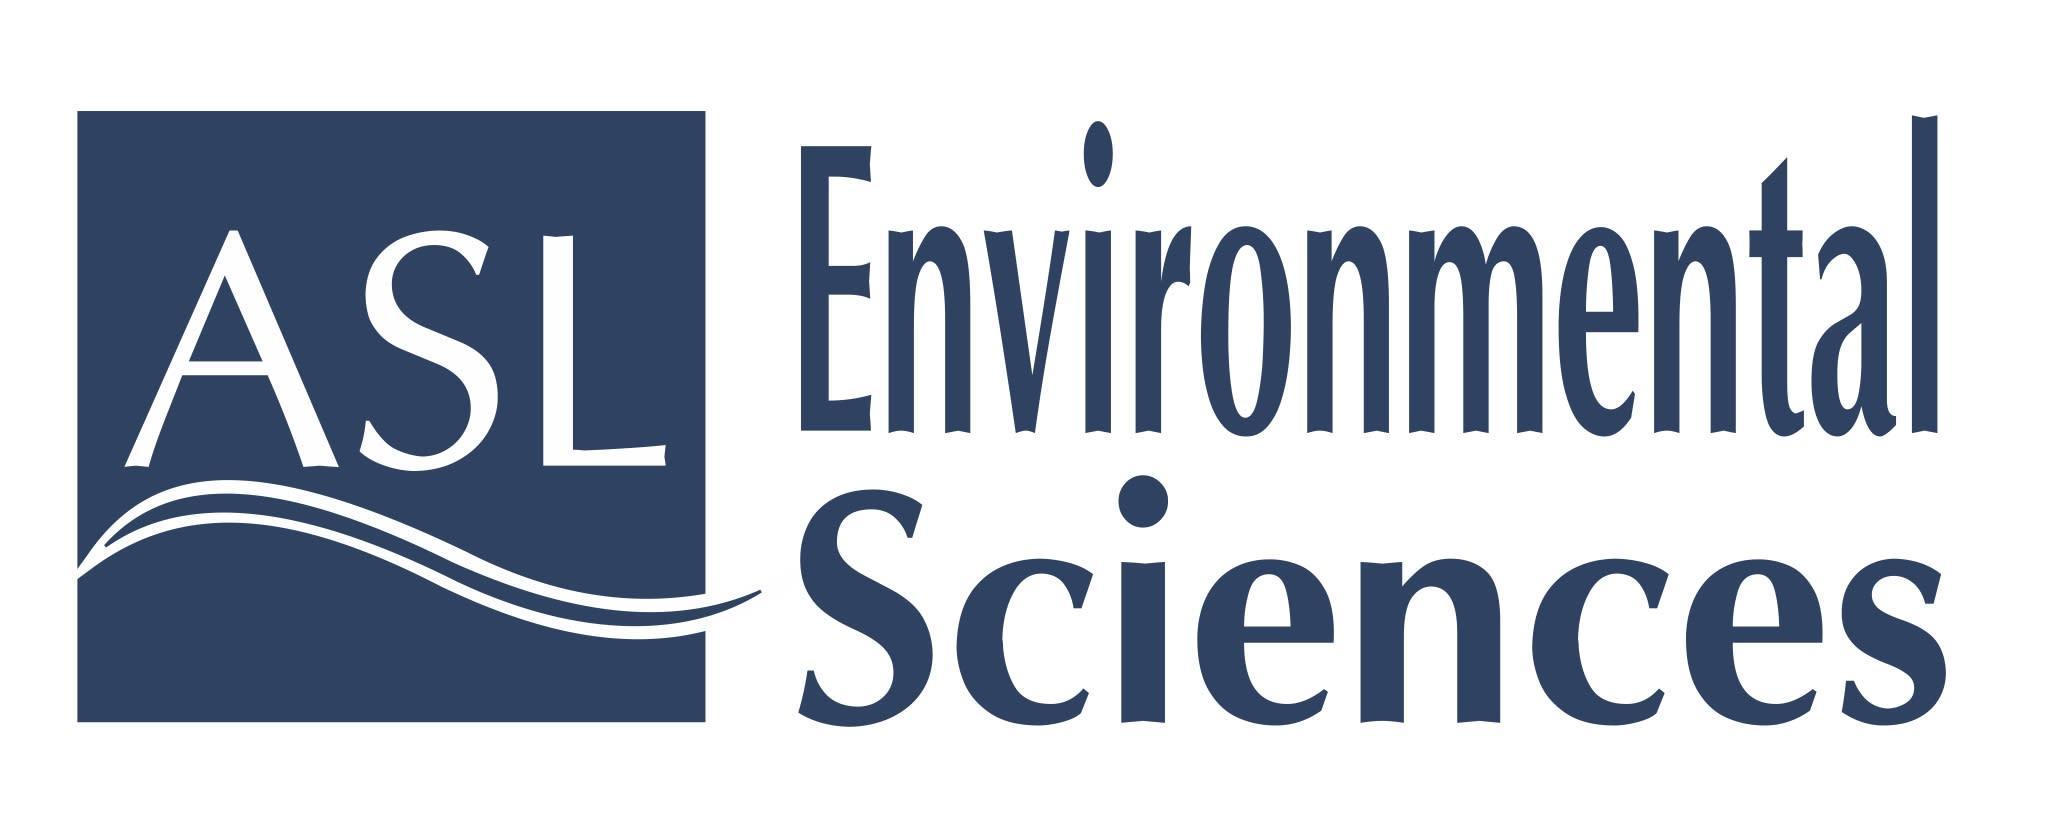 ASL Environmental Sciences Inc.